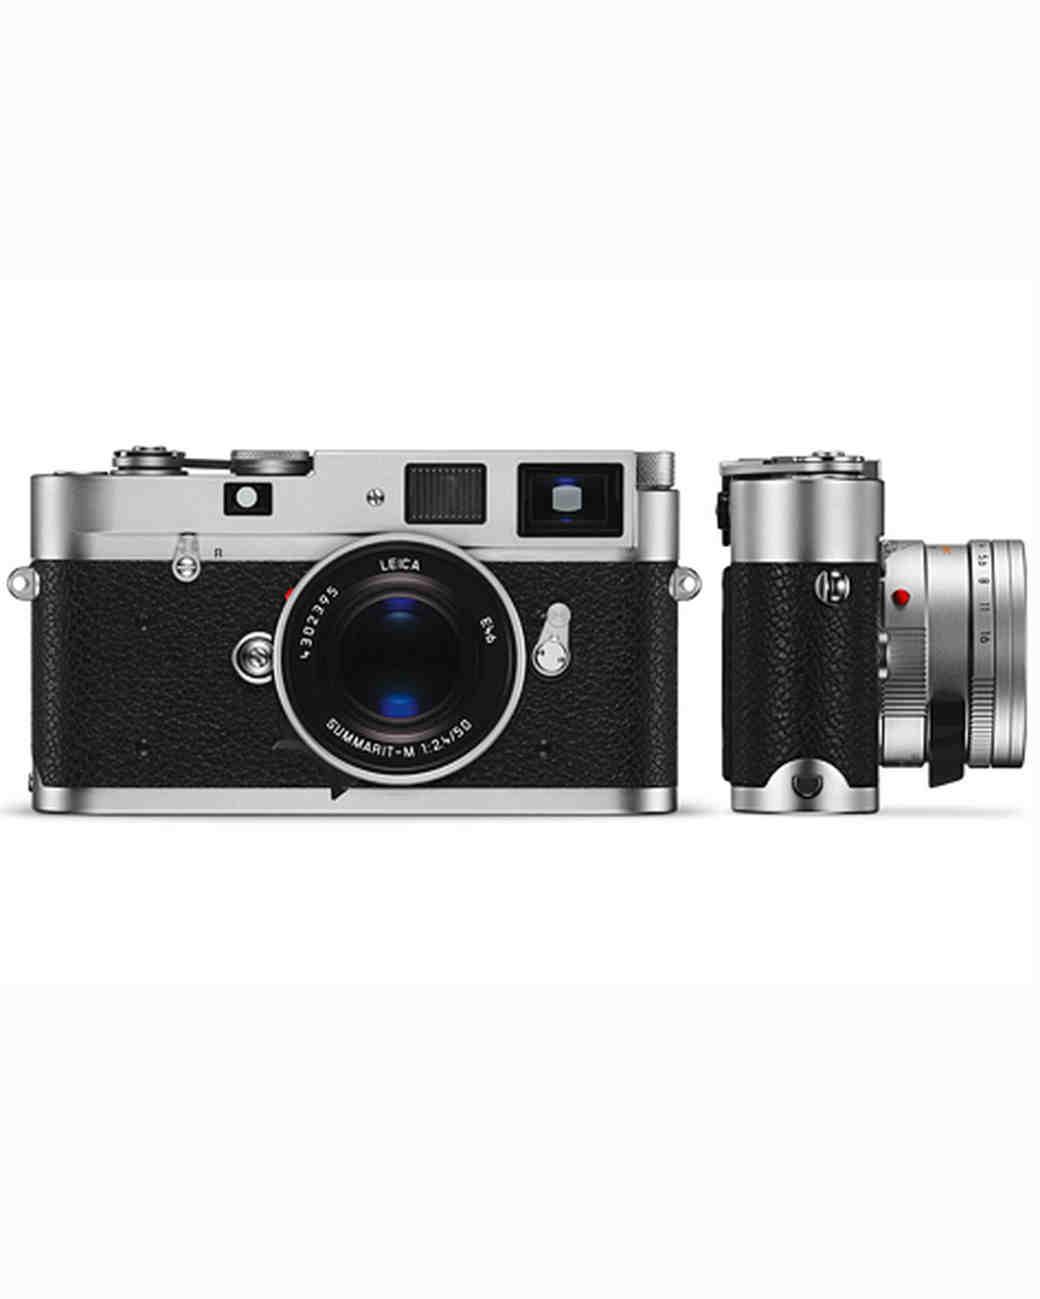 grooms-gift-leica-camera-0616.jpg